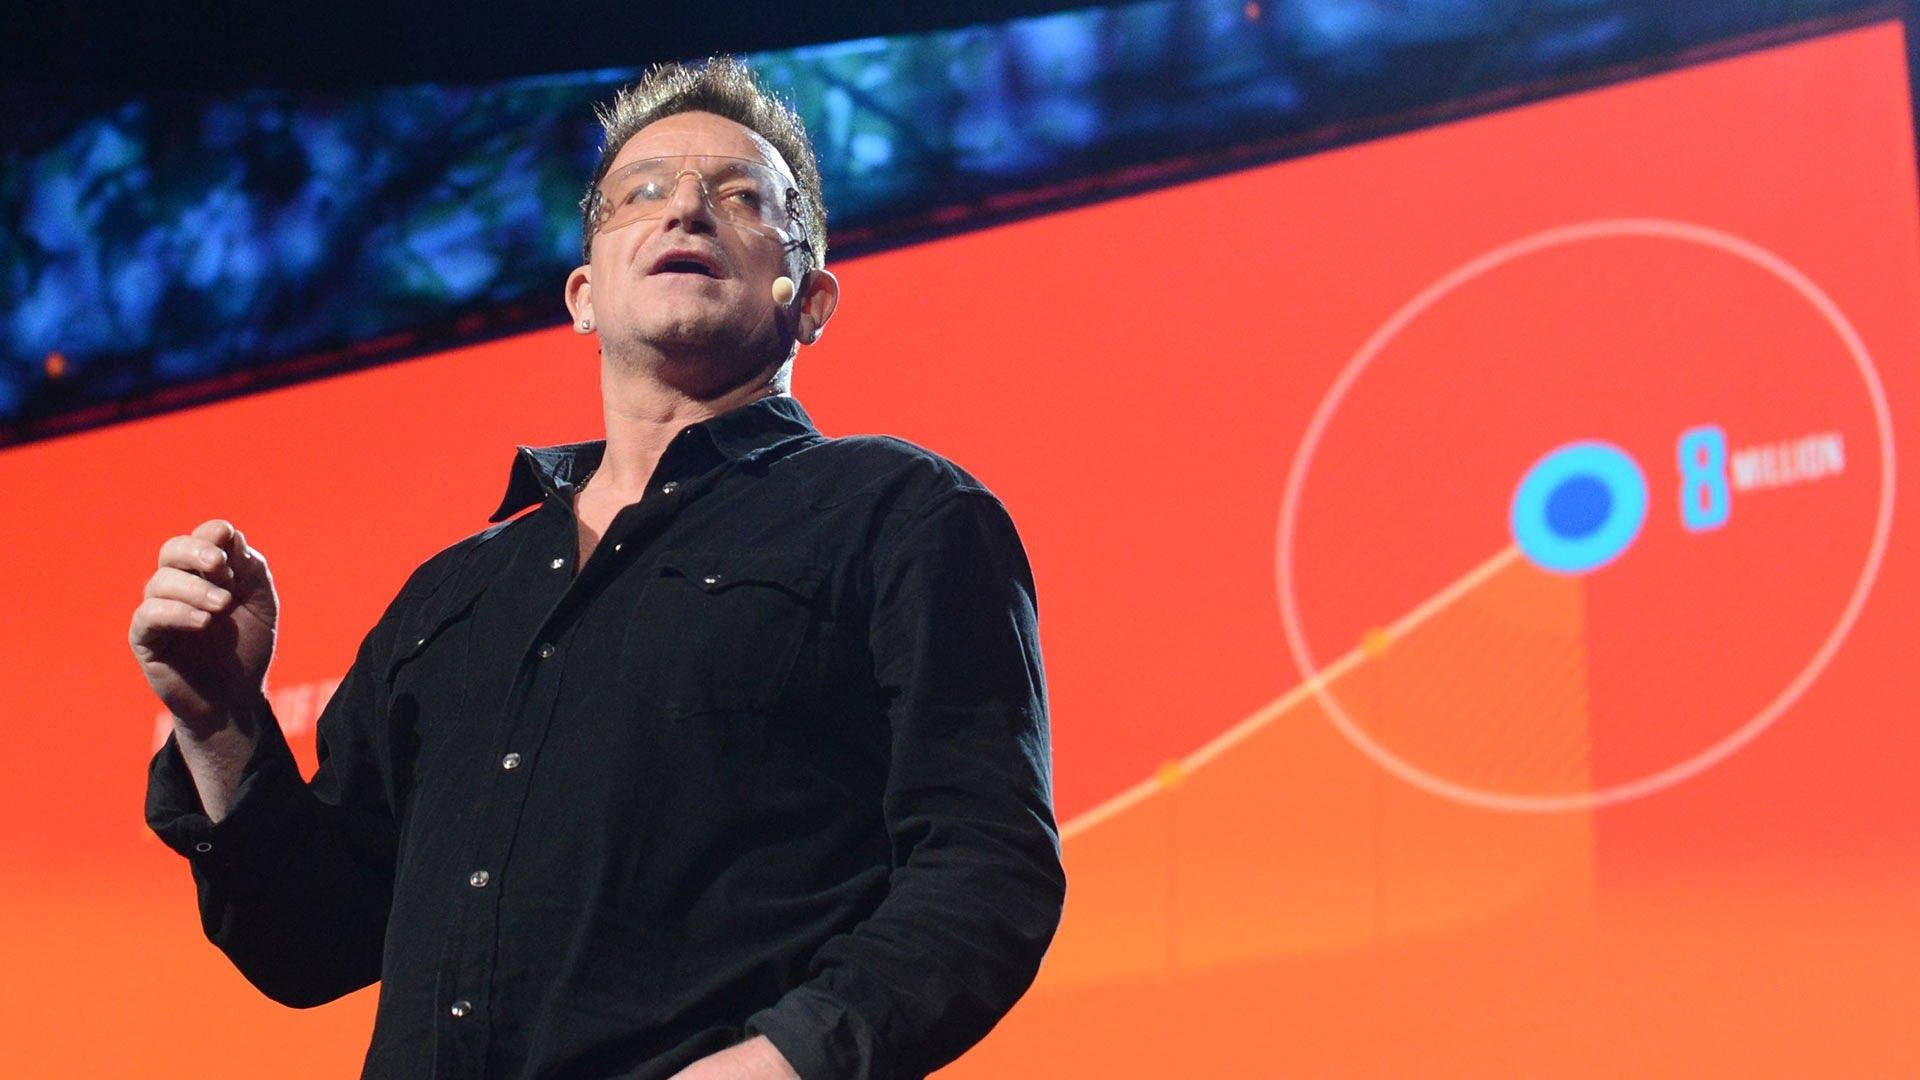 「Bono:關於貧窮的好消息(沒錯,真的有好消息)」- The Good News on Poverty (Yes, There's Good News)